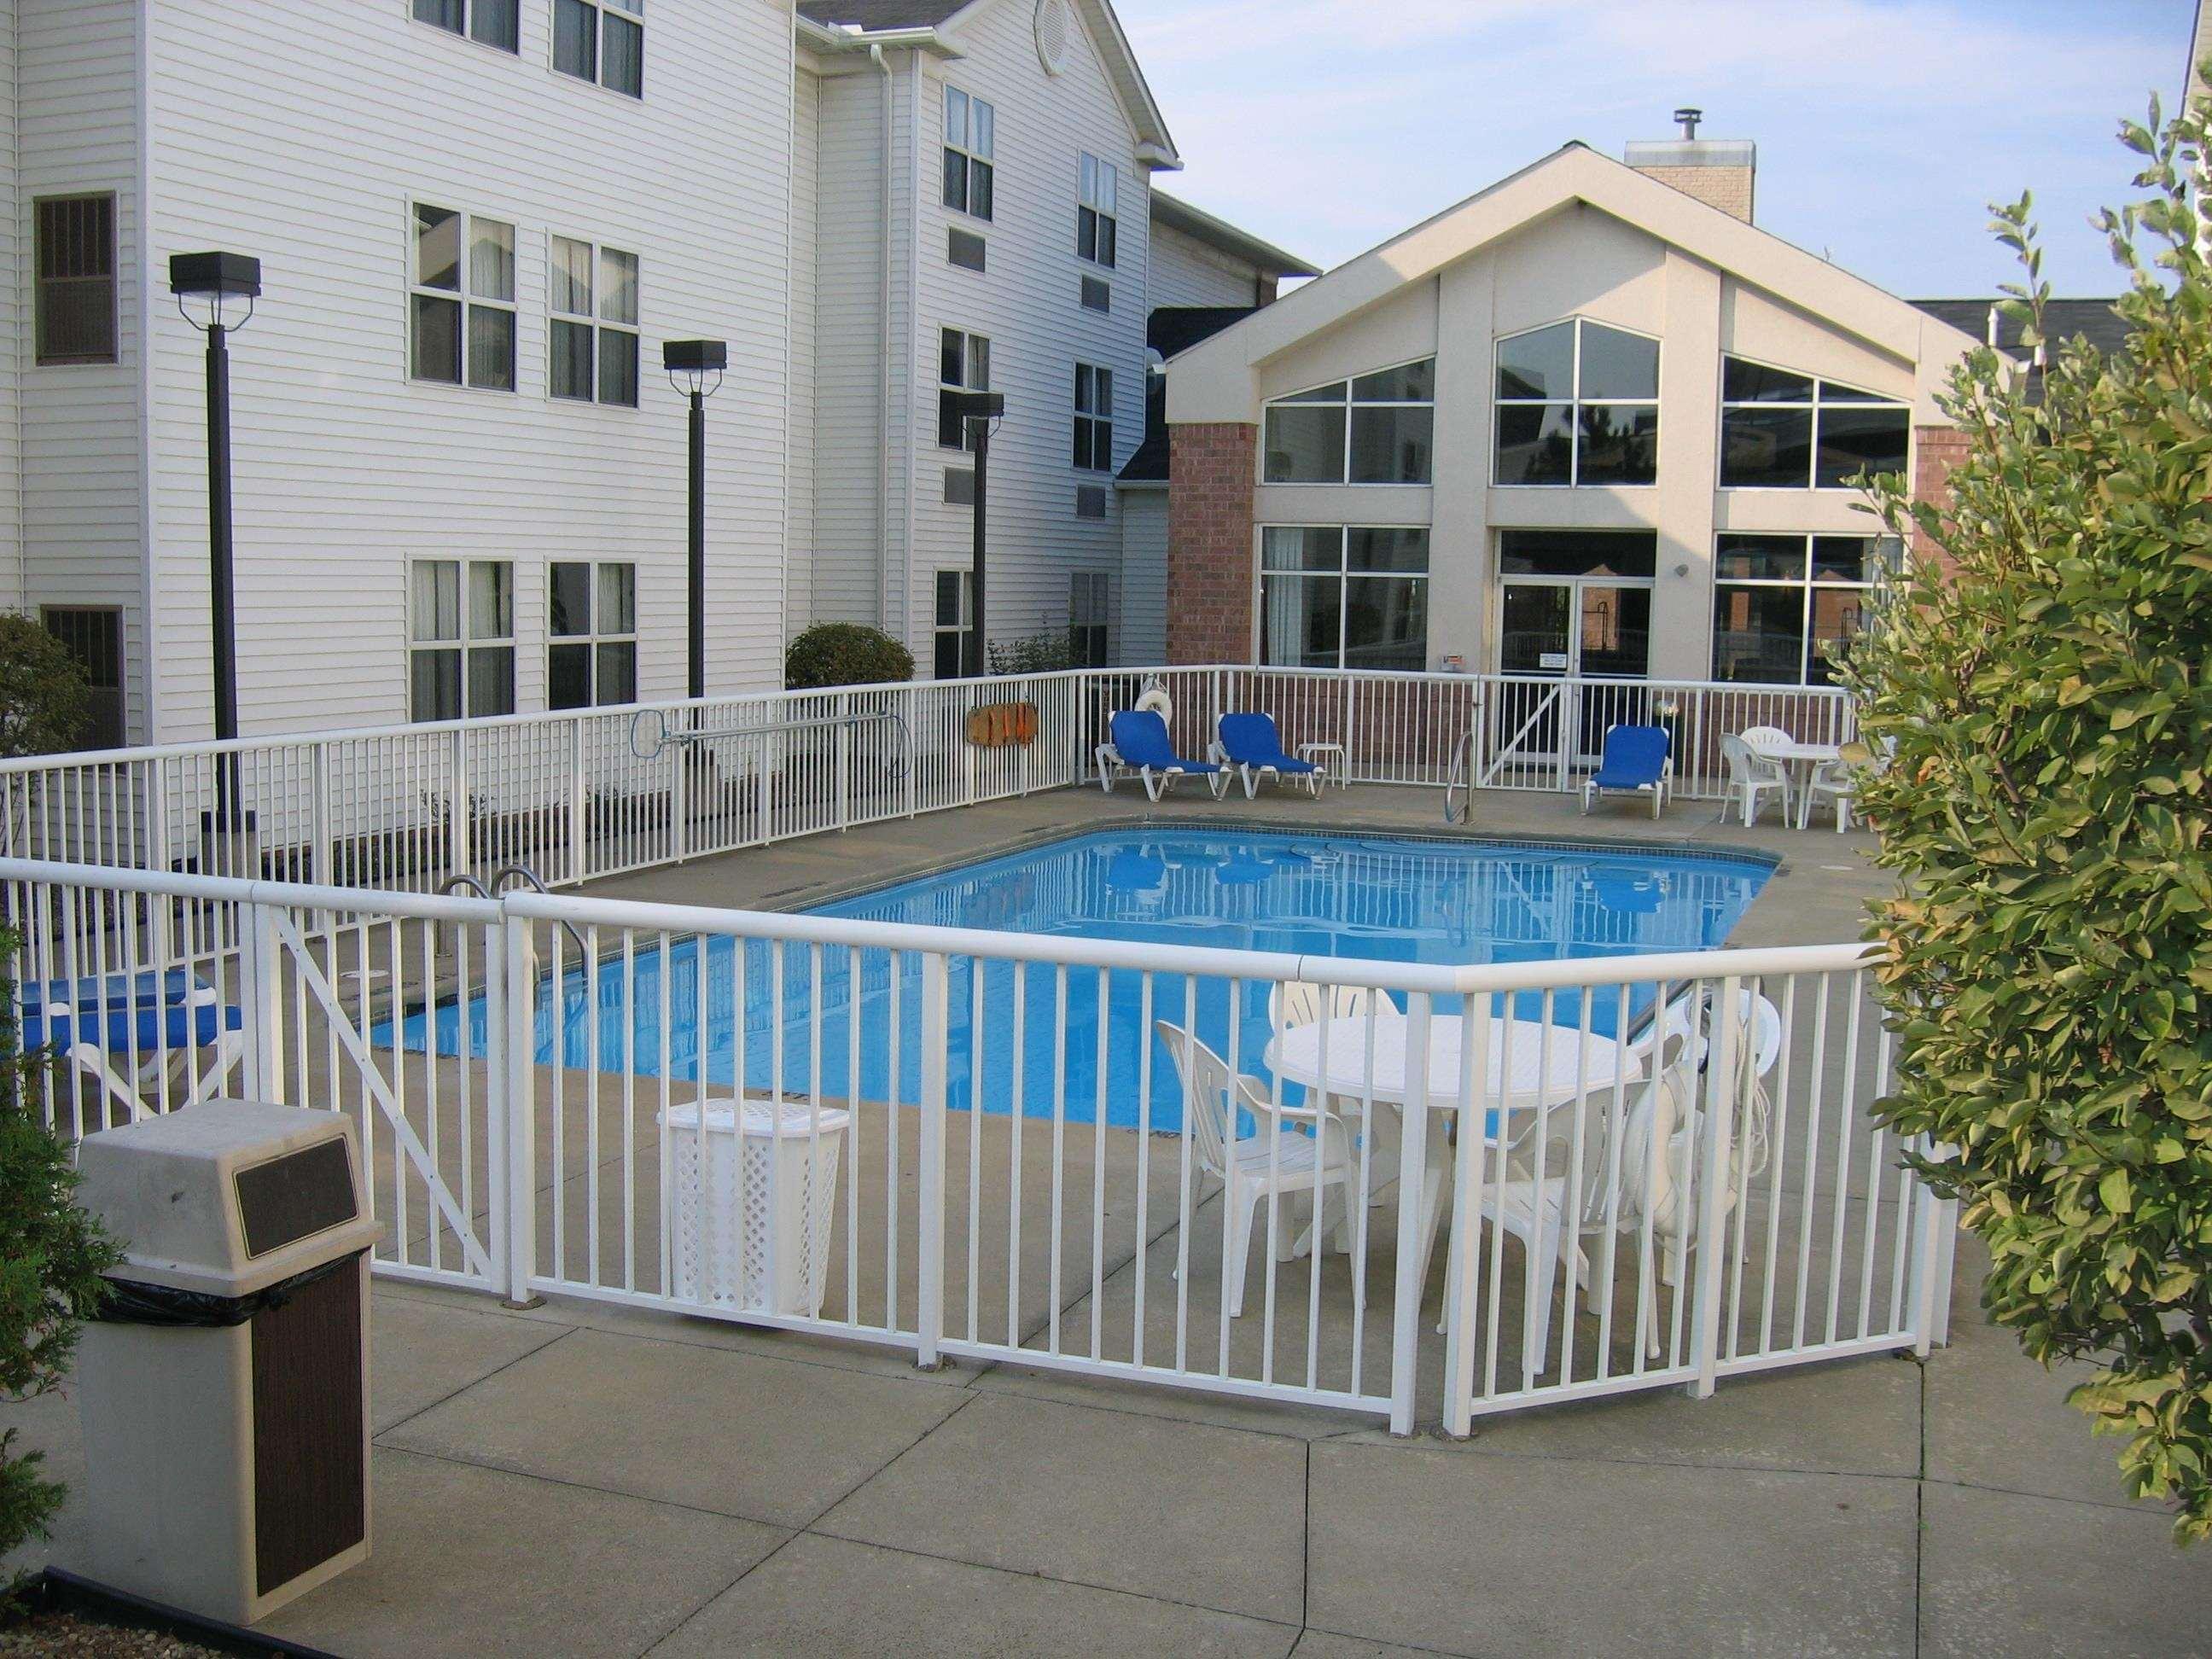 Hampton Inn & Suites Cleveland/Independence image 6